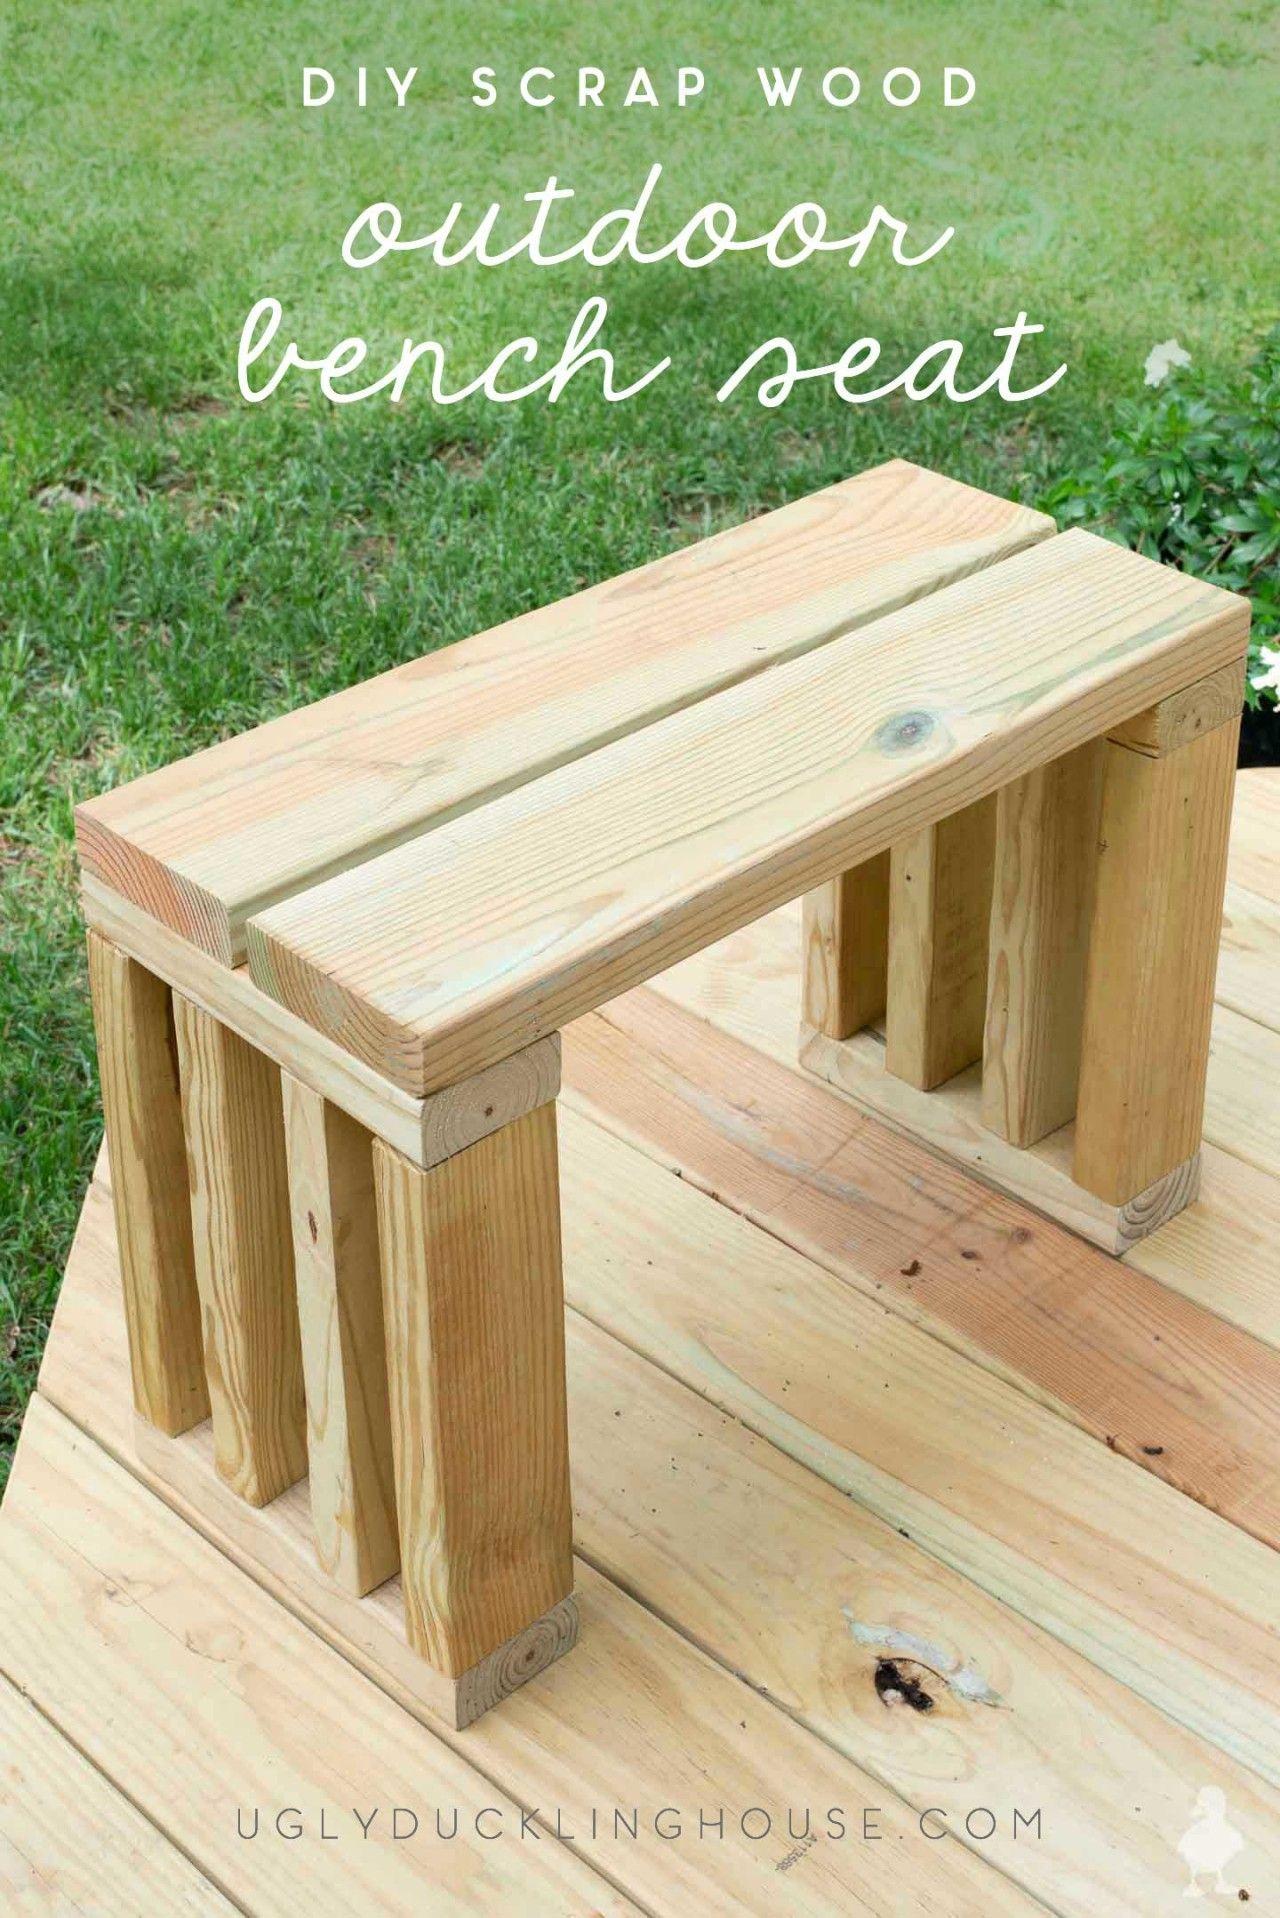 DIY Outdoor Bench Seat Outdoor furniture plans, Diy